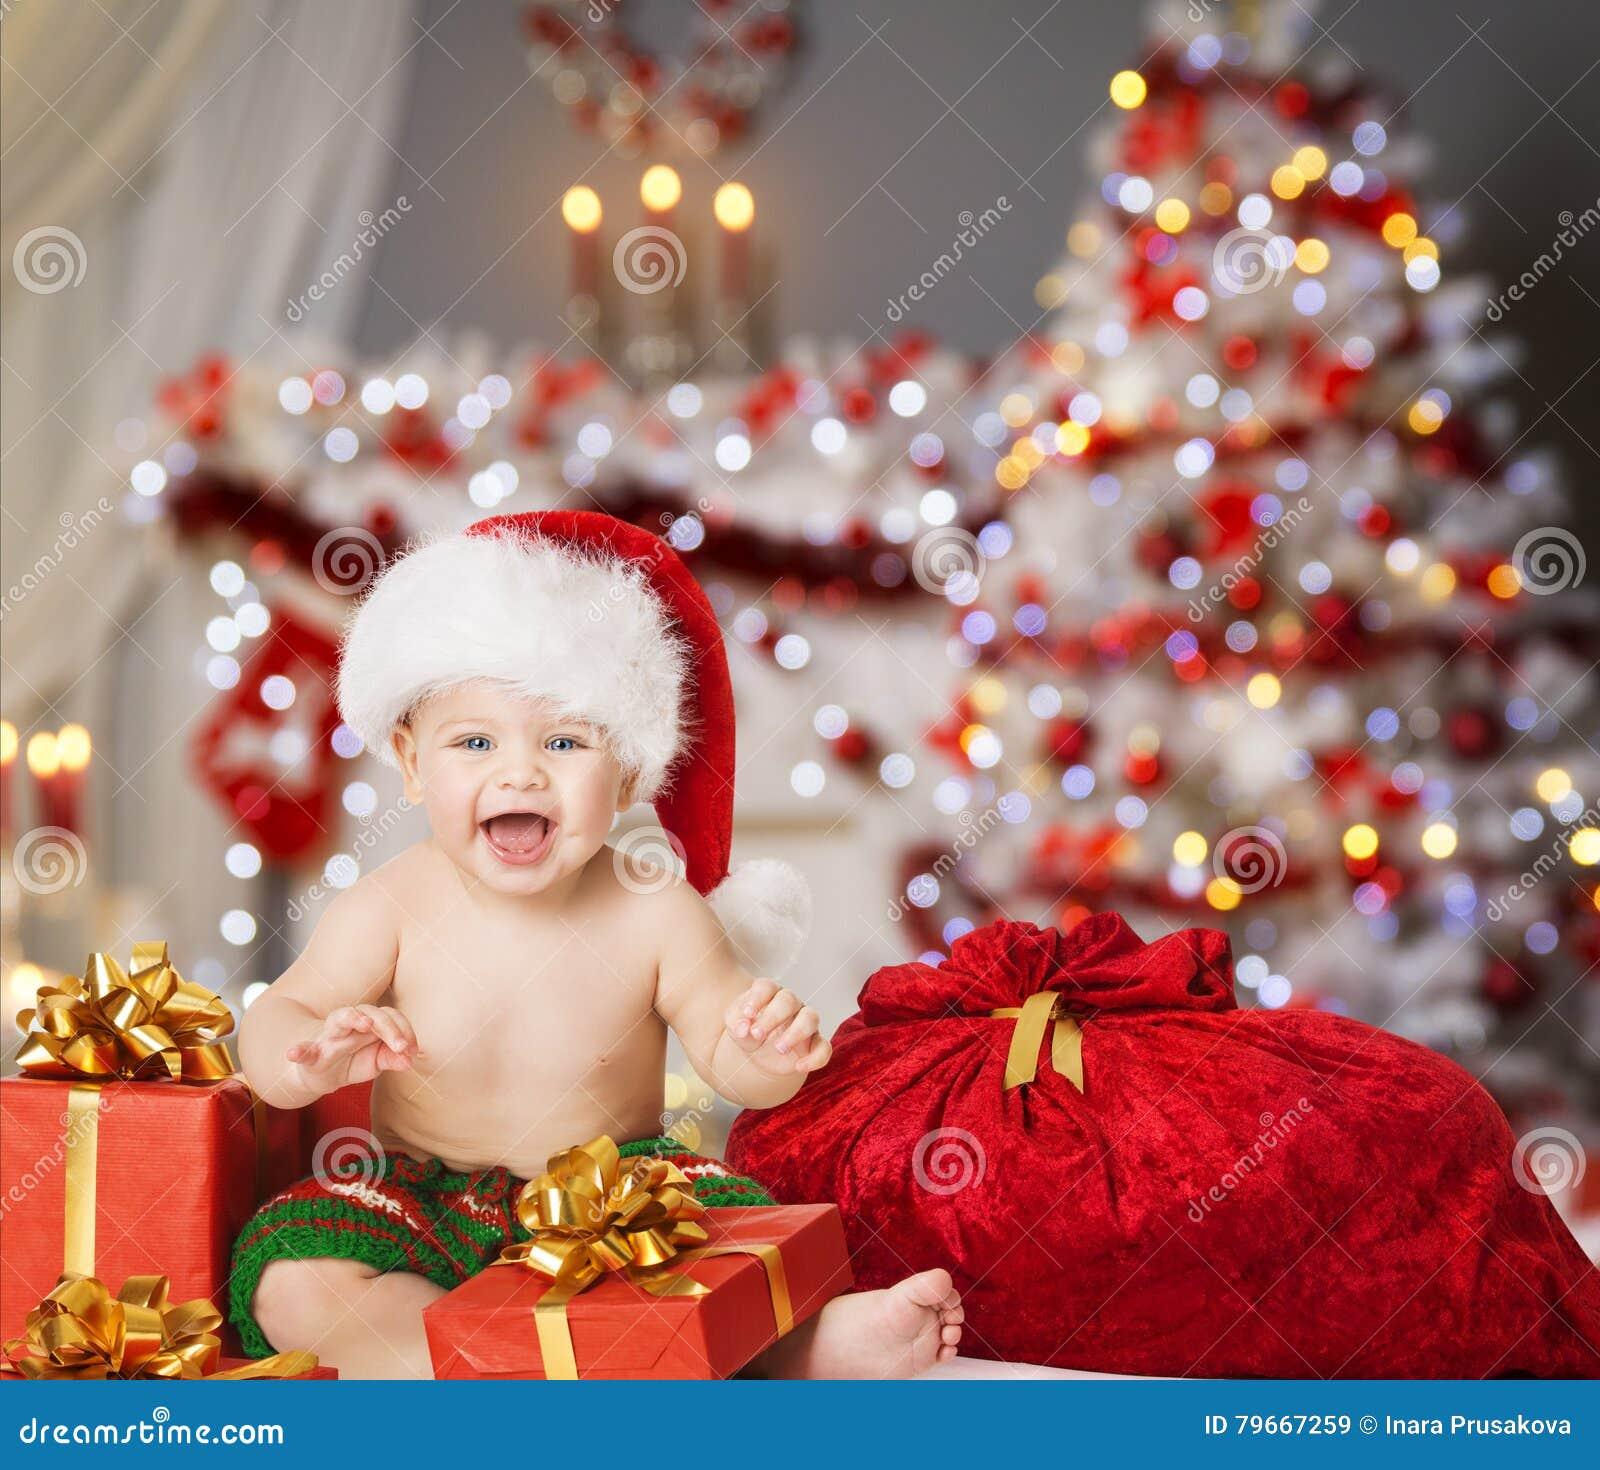 Christmas baby in santa hat kid boy in xmas interior present gift box and bag